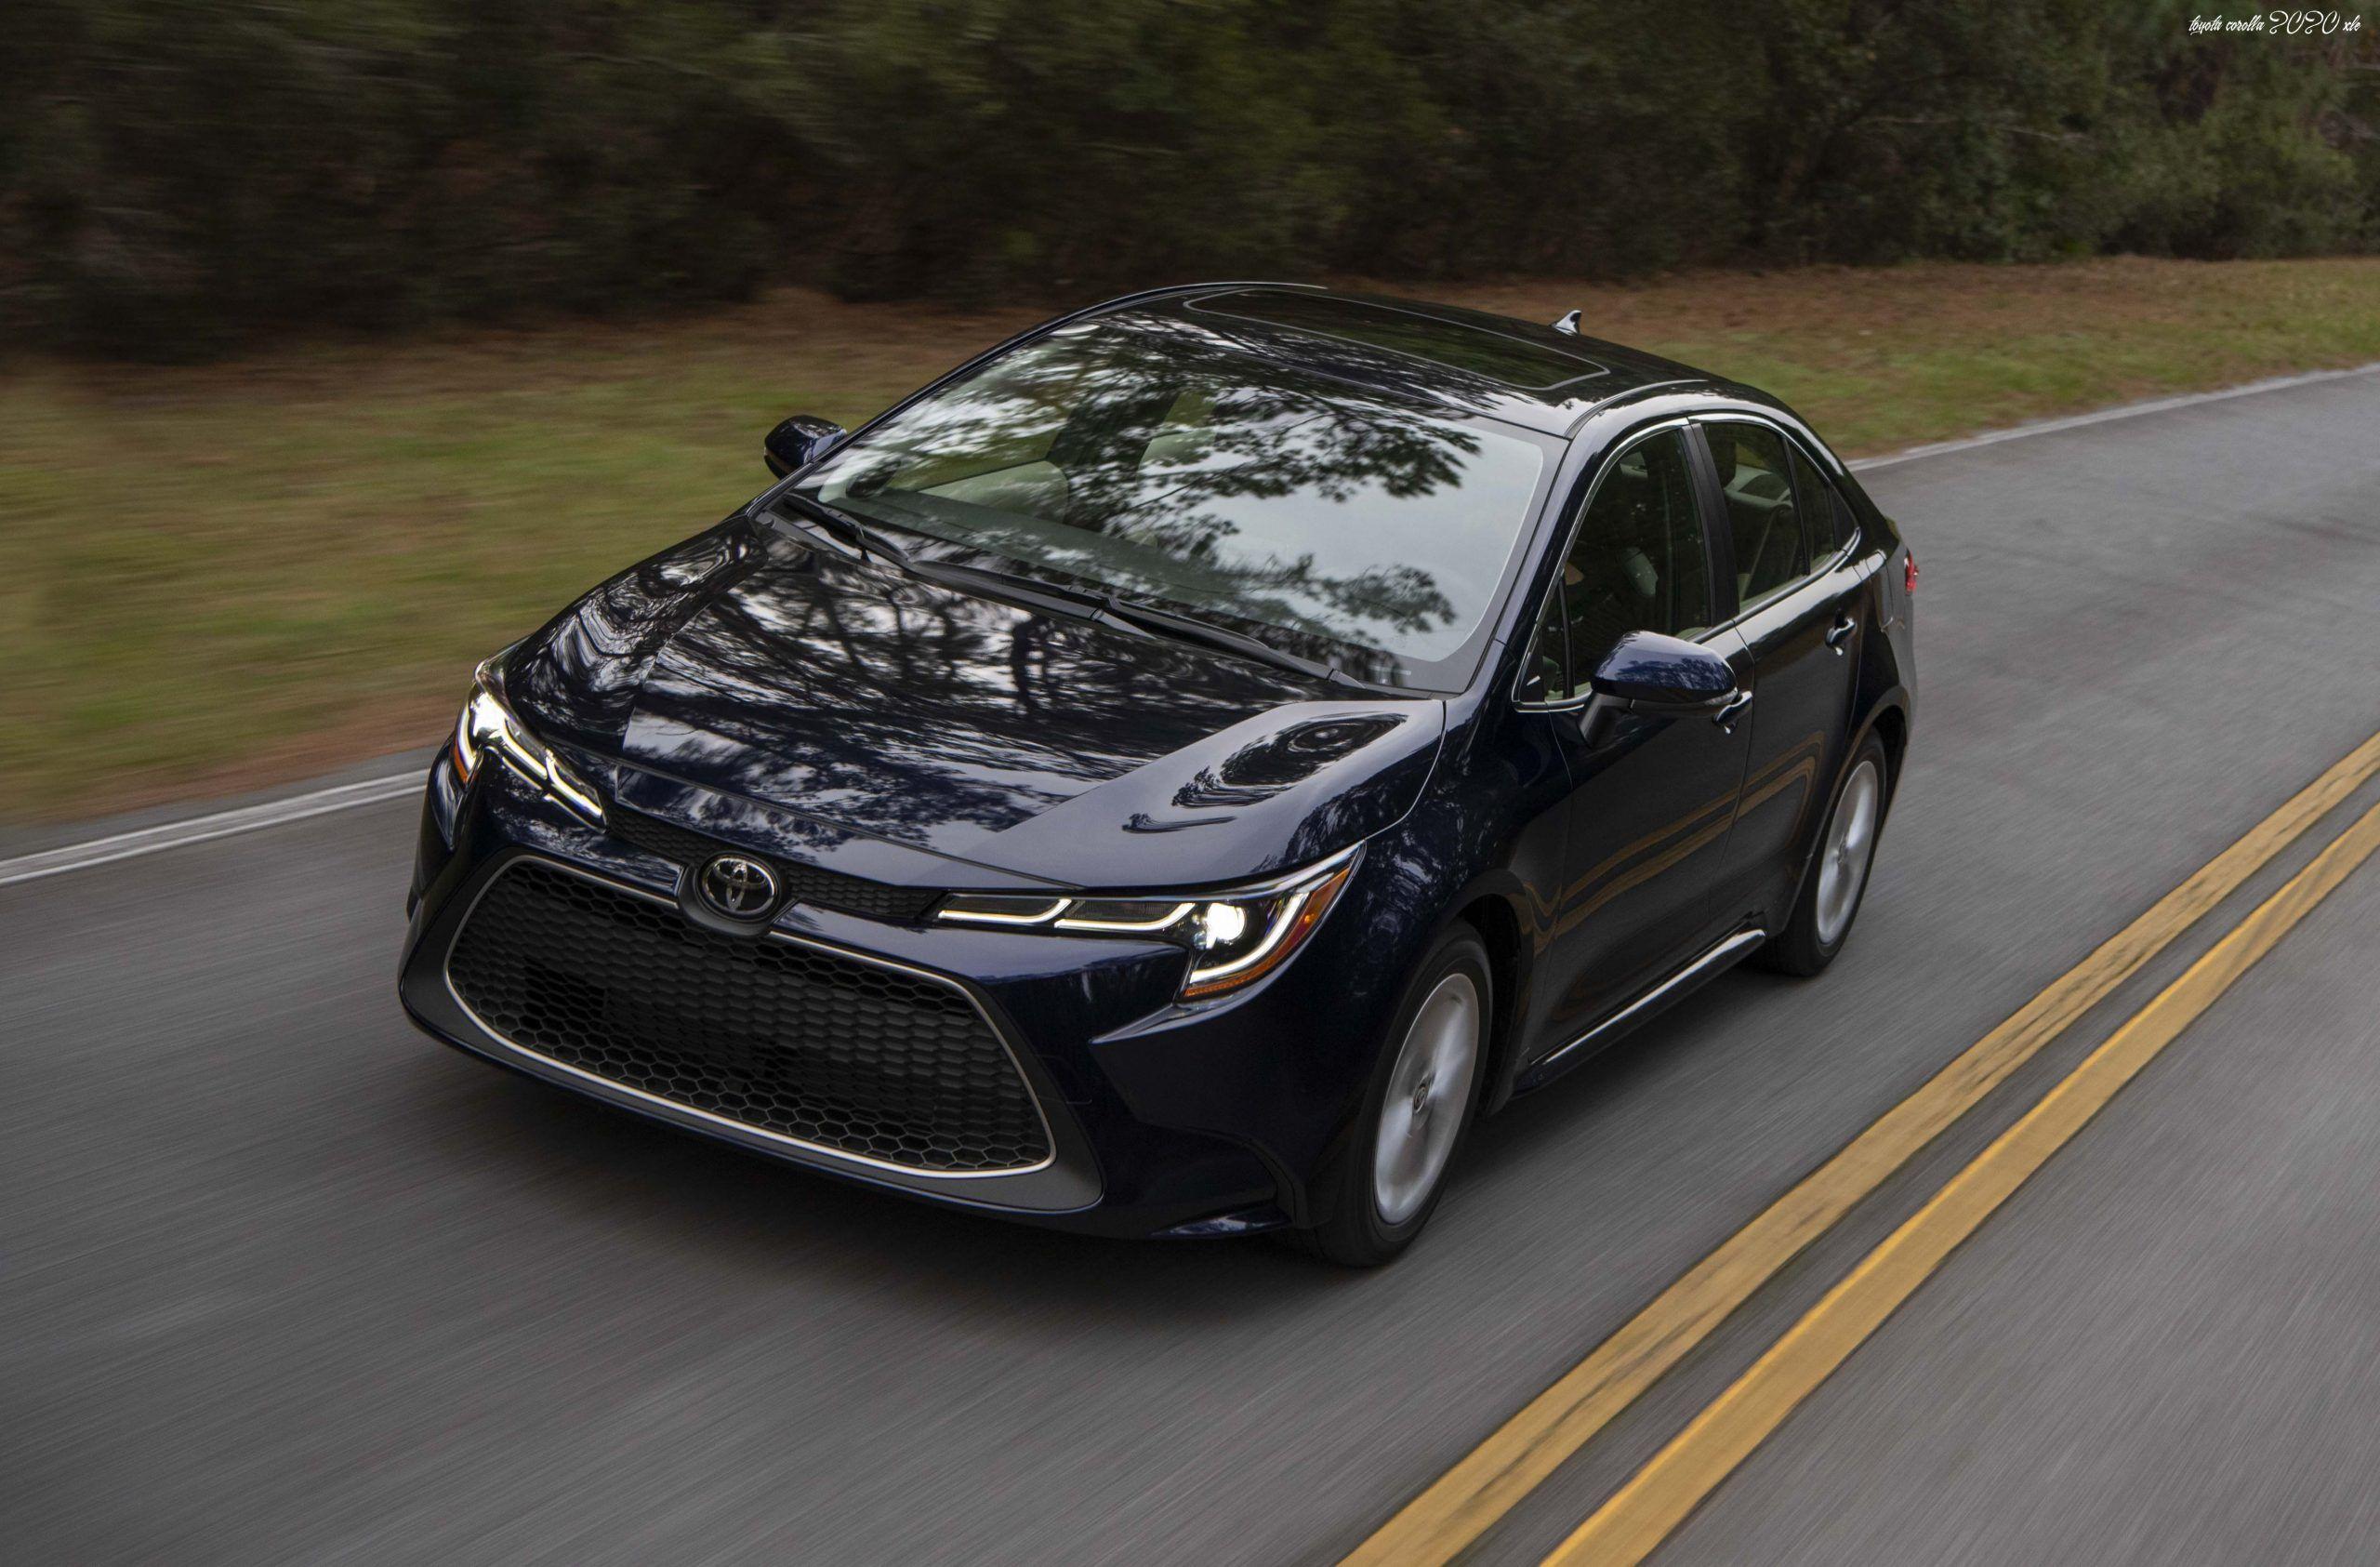 Toyota Corolla 2020 Xle Speed Test In 2020 Toyota Corolla Toyota Corolla Hatchback